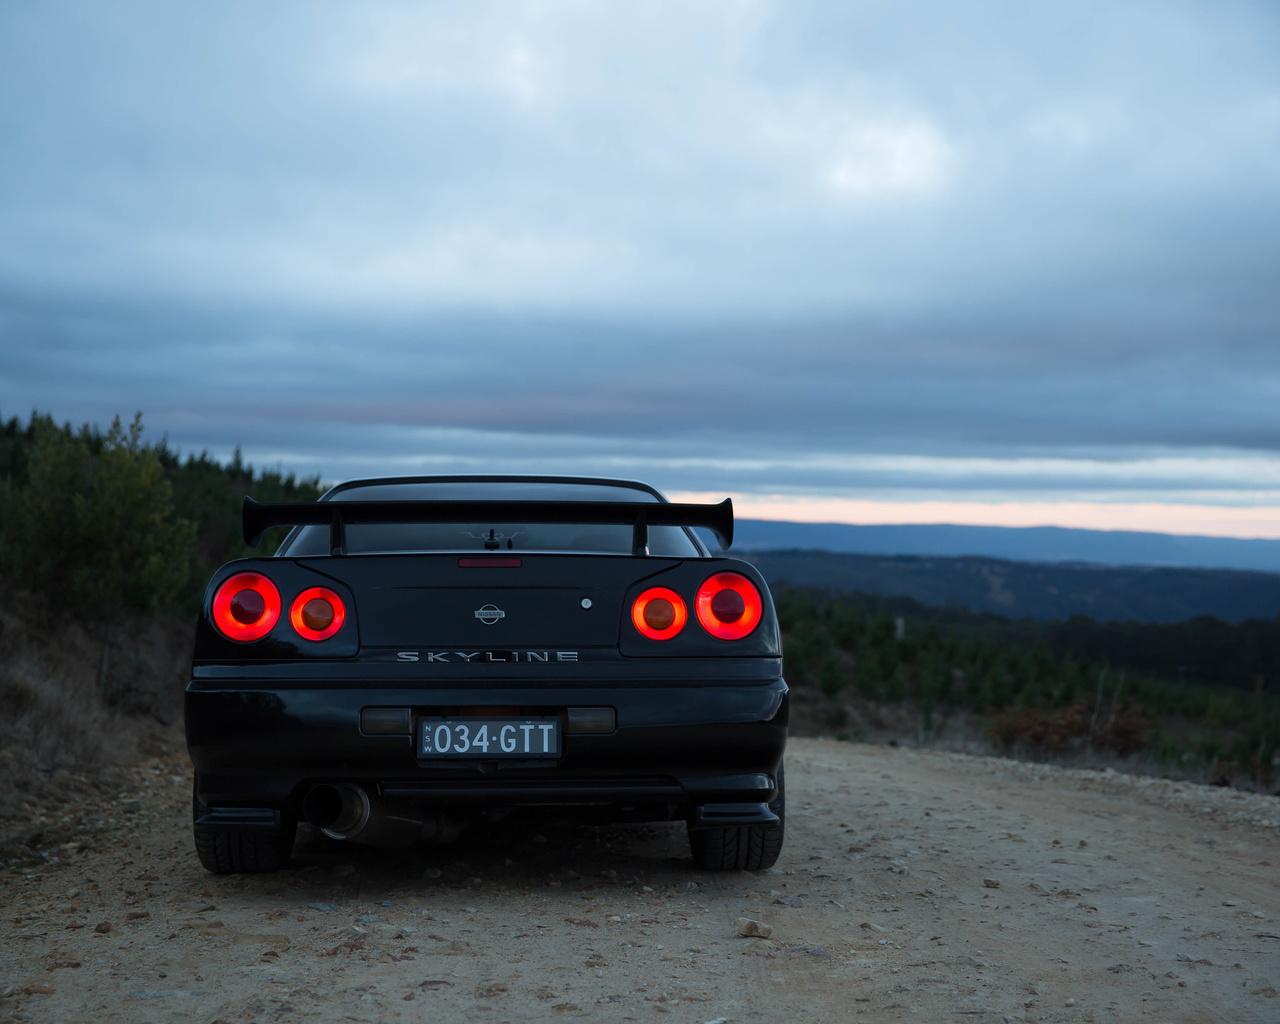 nissan skyline, r34, road, car, black car, nature